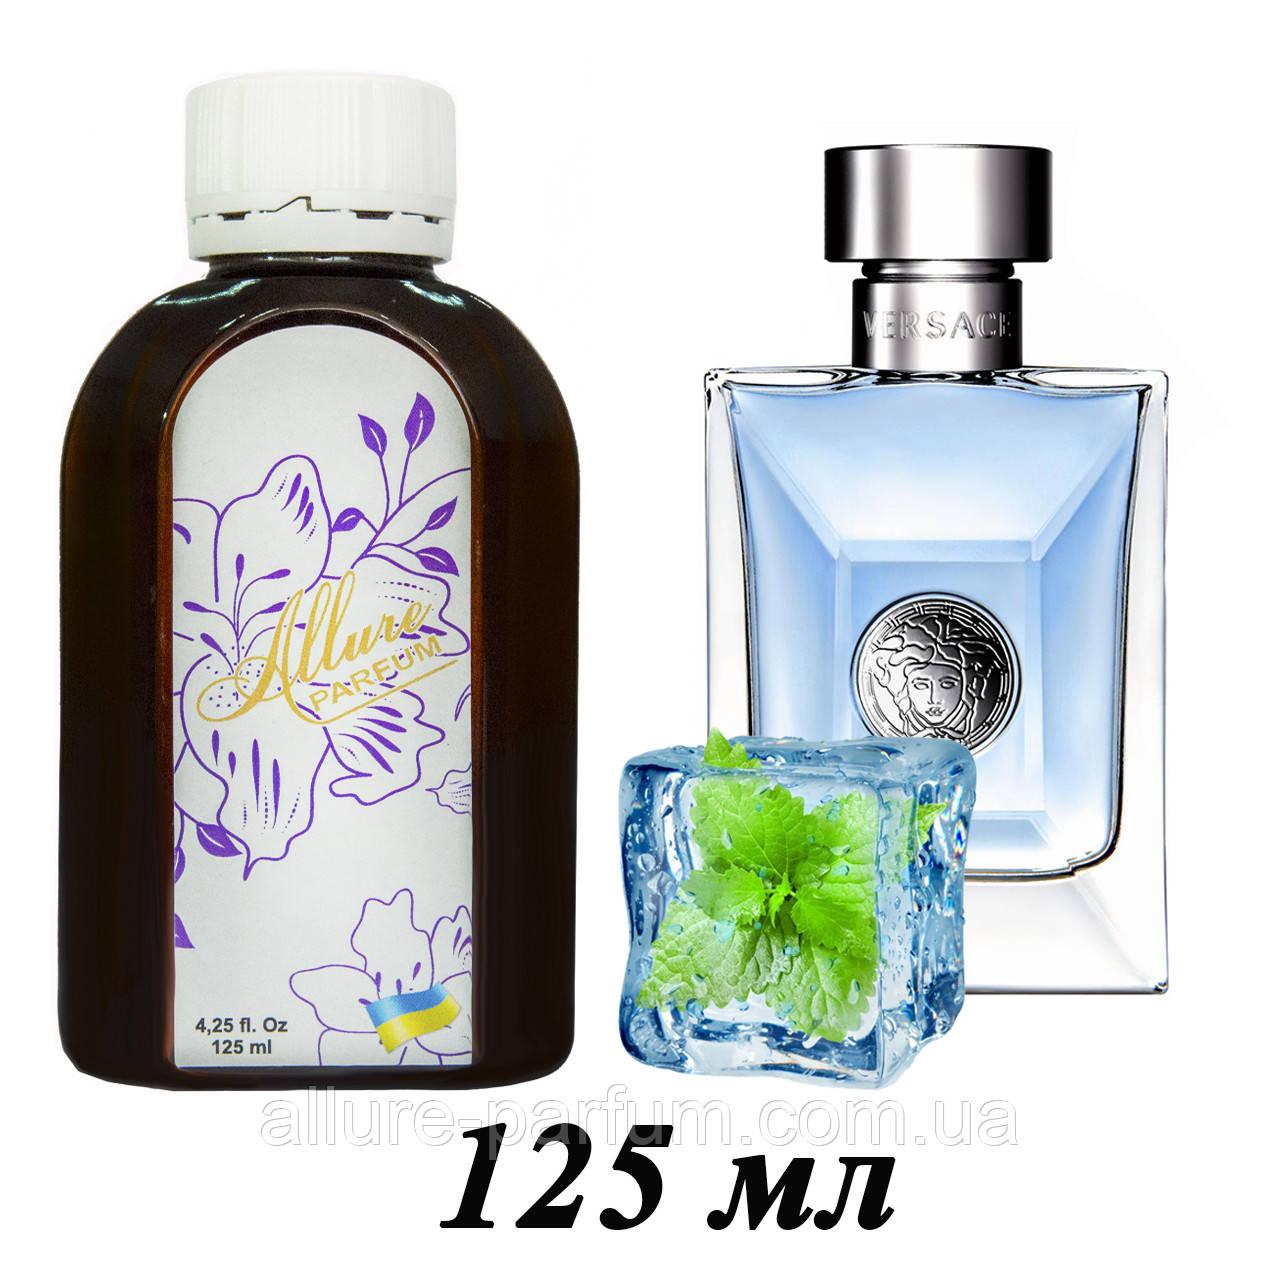 Мужской парфюм Versace/ Pour Homme 125 мл, фото 1